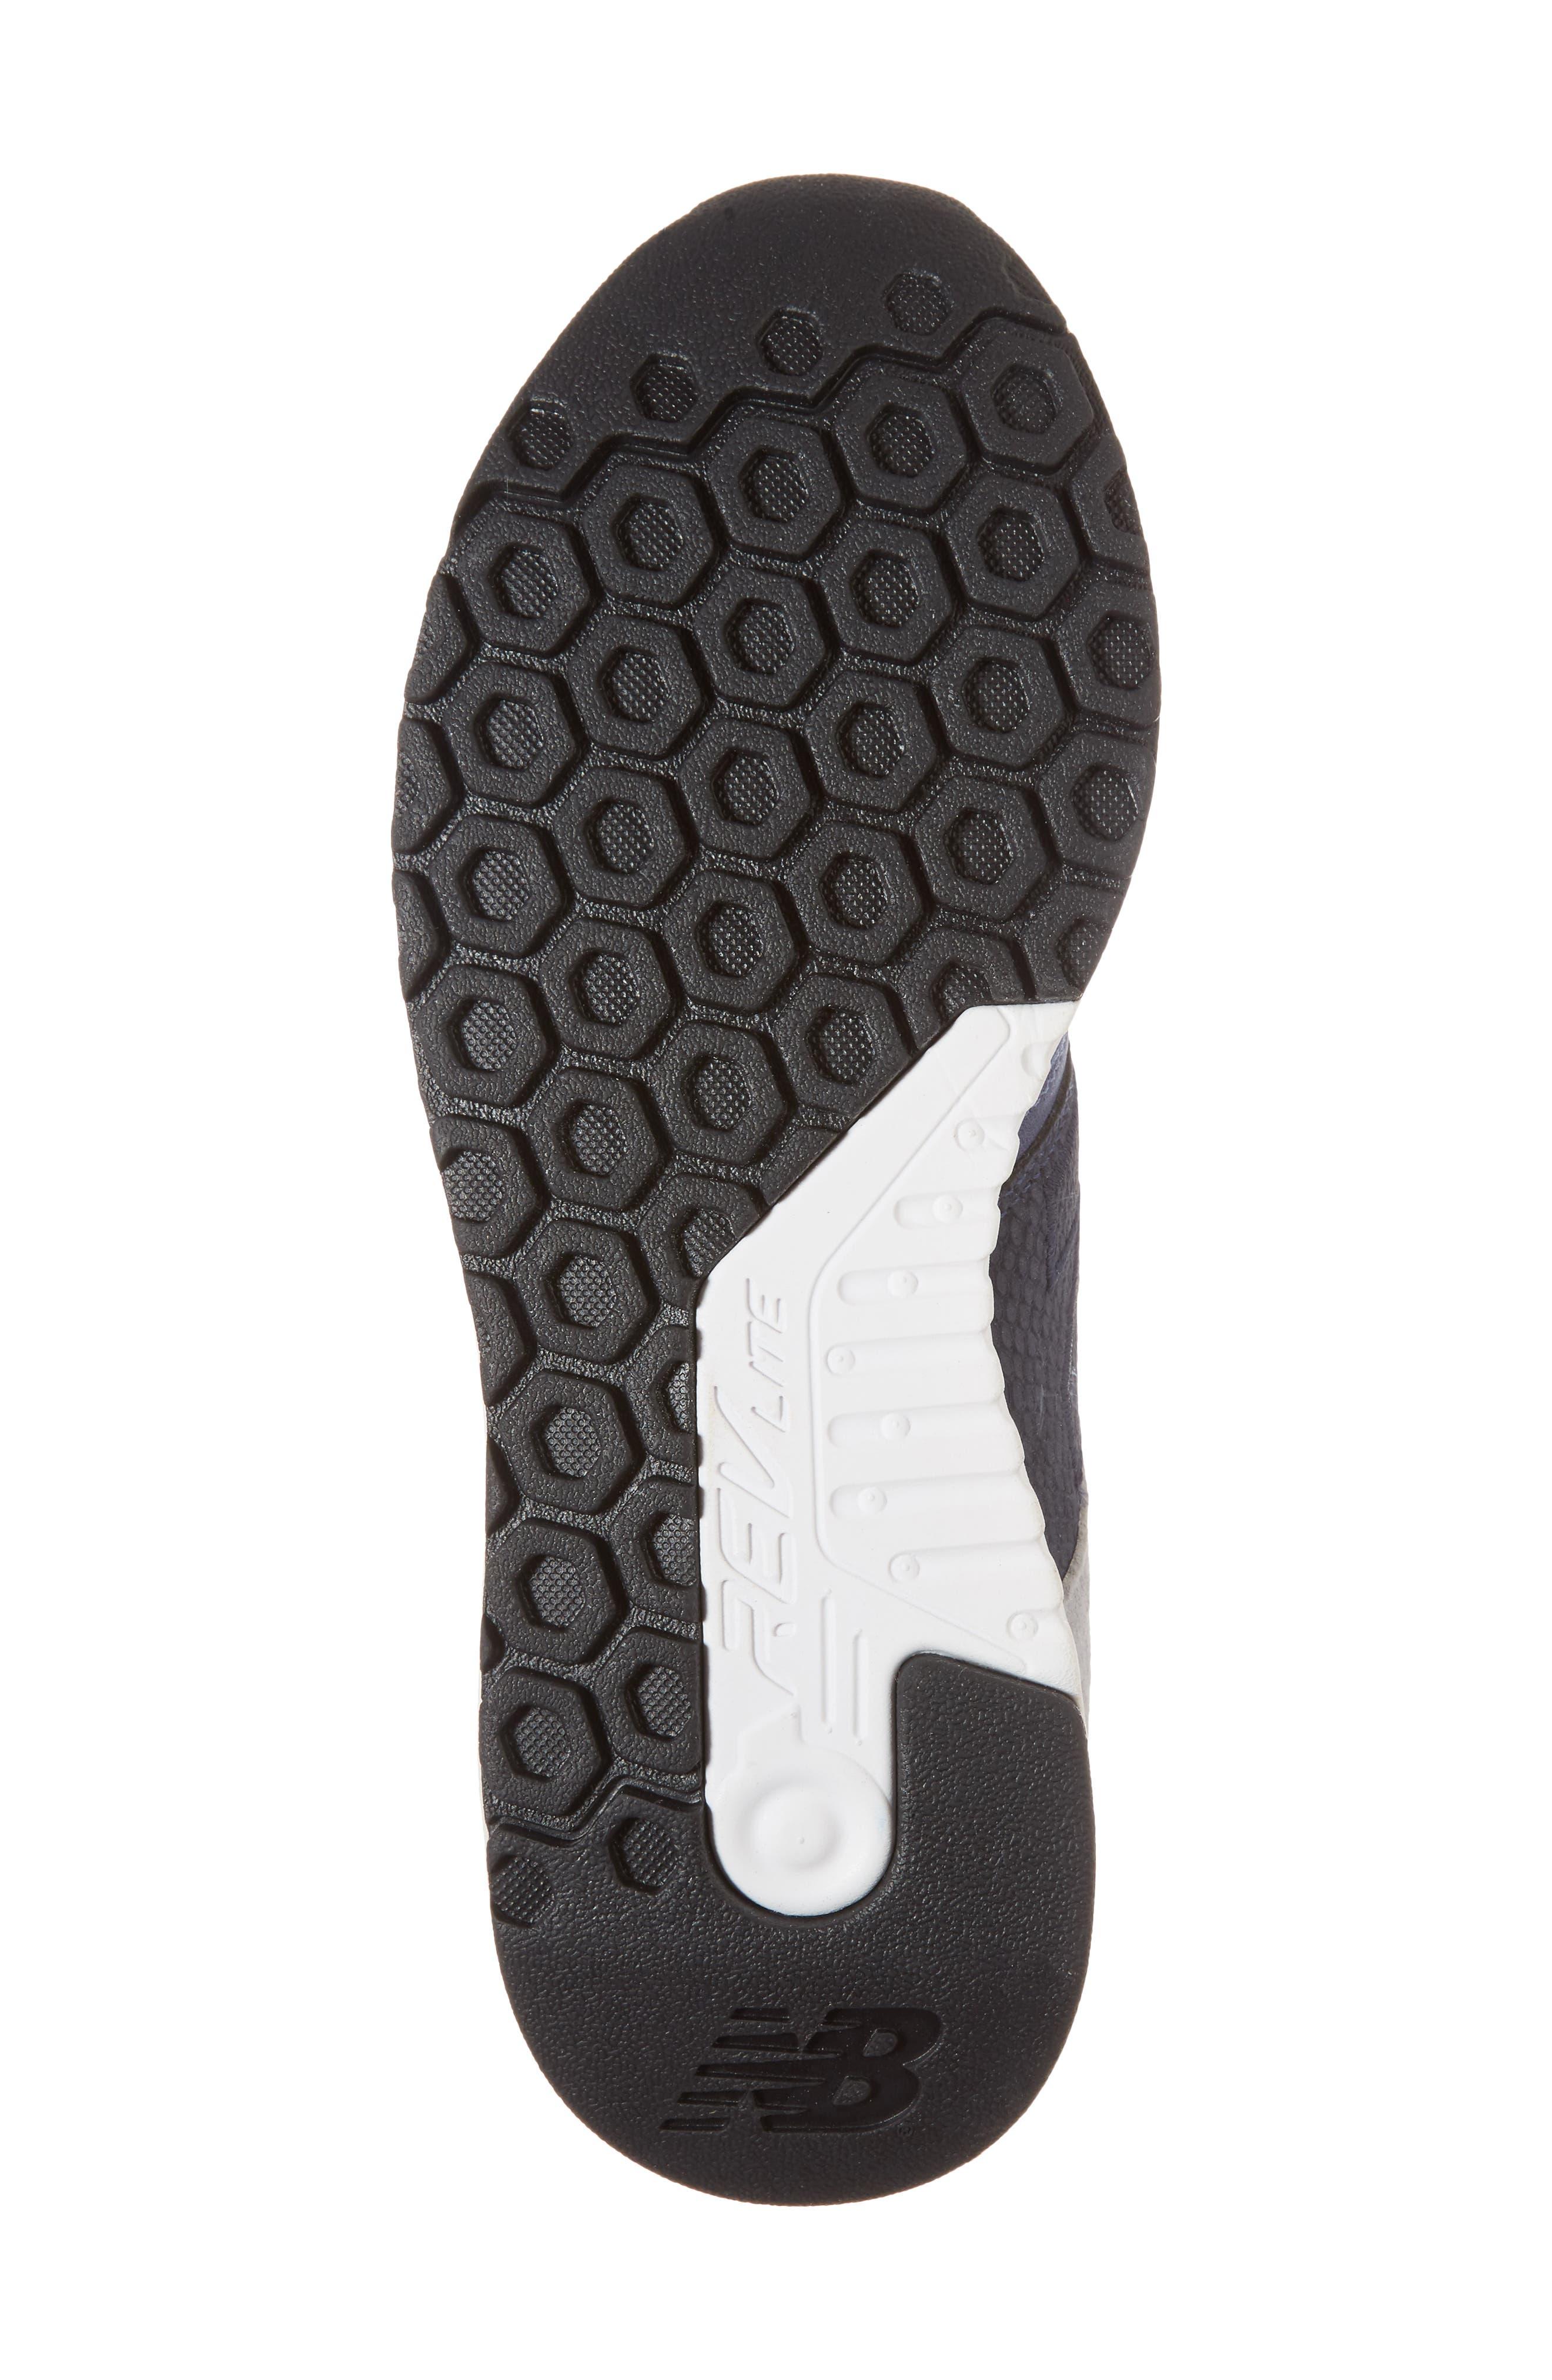 247 Luxe Sneaker,                             Alternate thumbnail 6, color,                             Blue